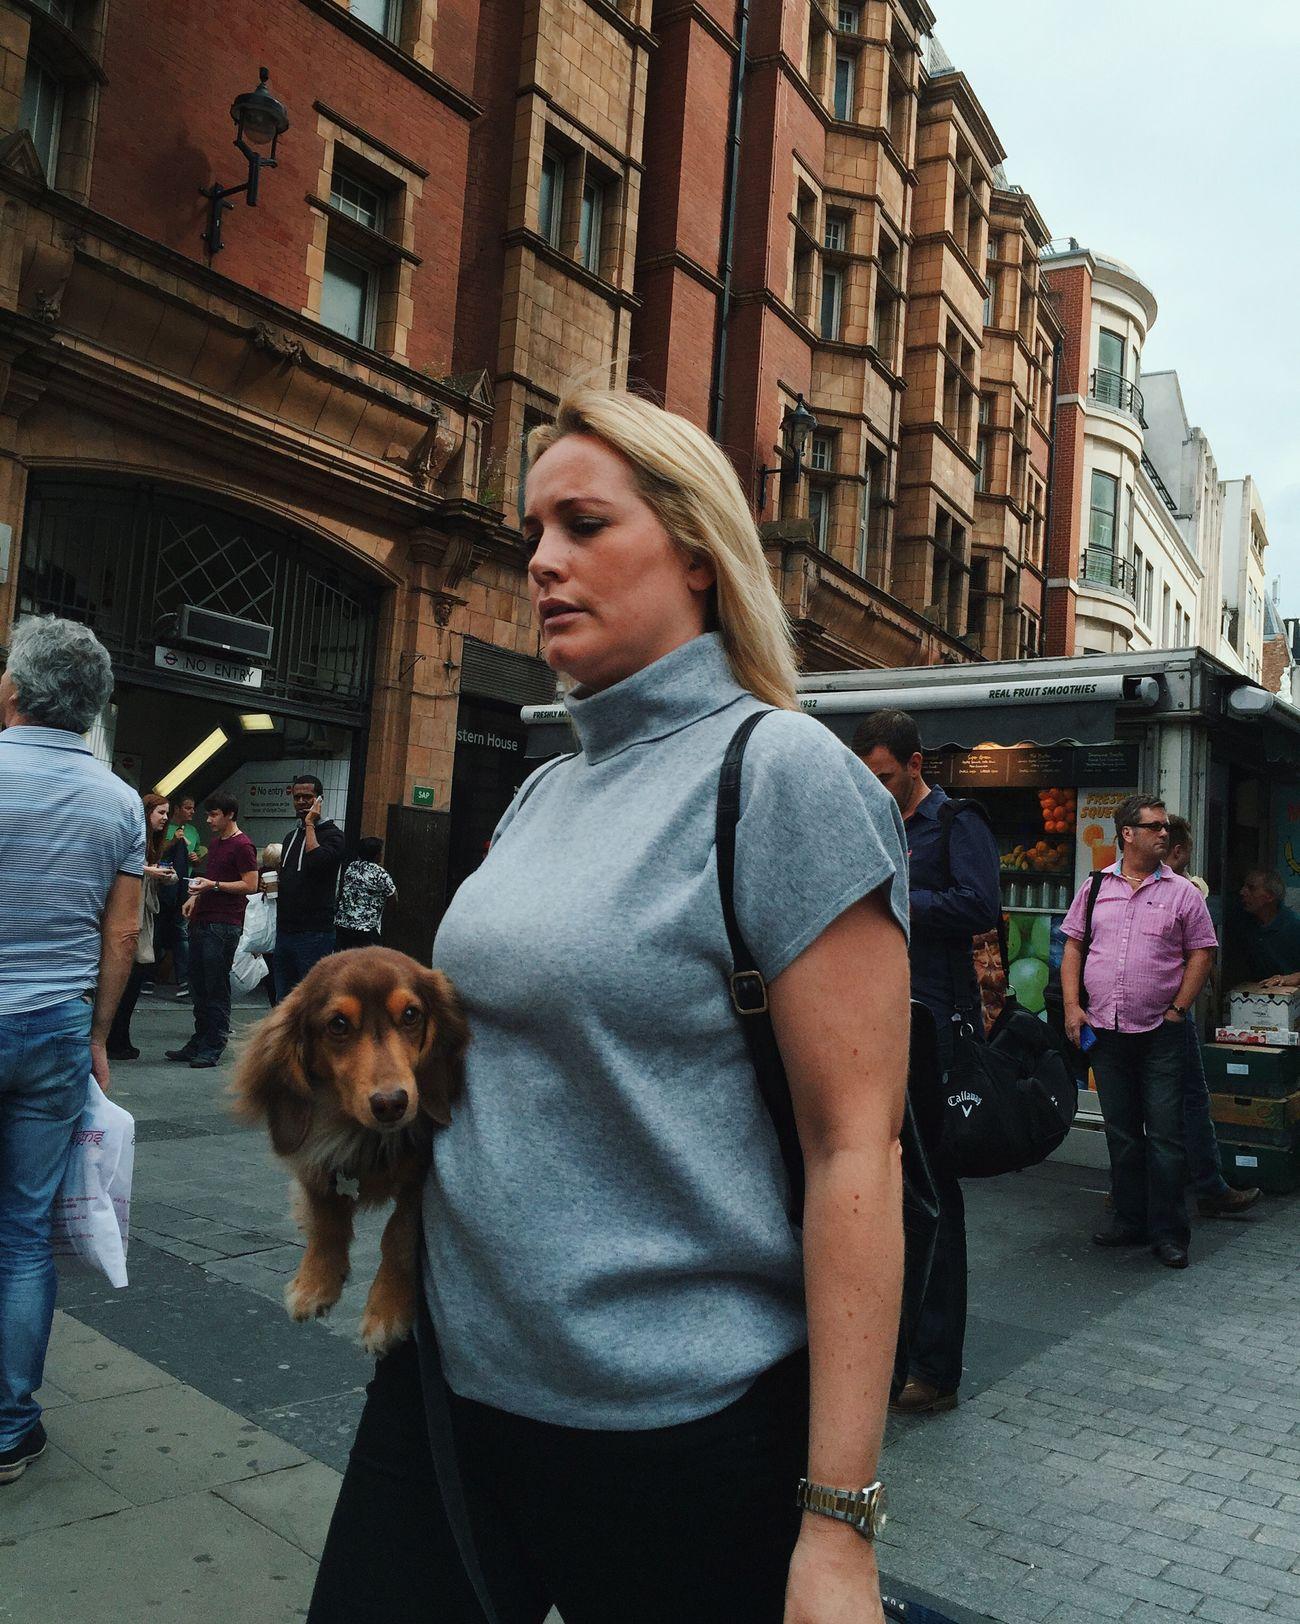 TPG Street Photography Streetphotography Everybodystreet London